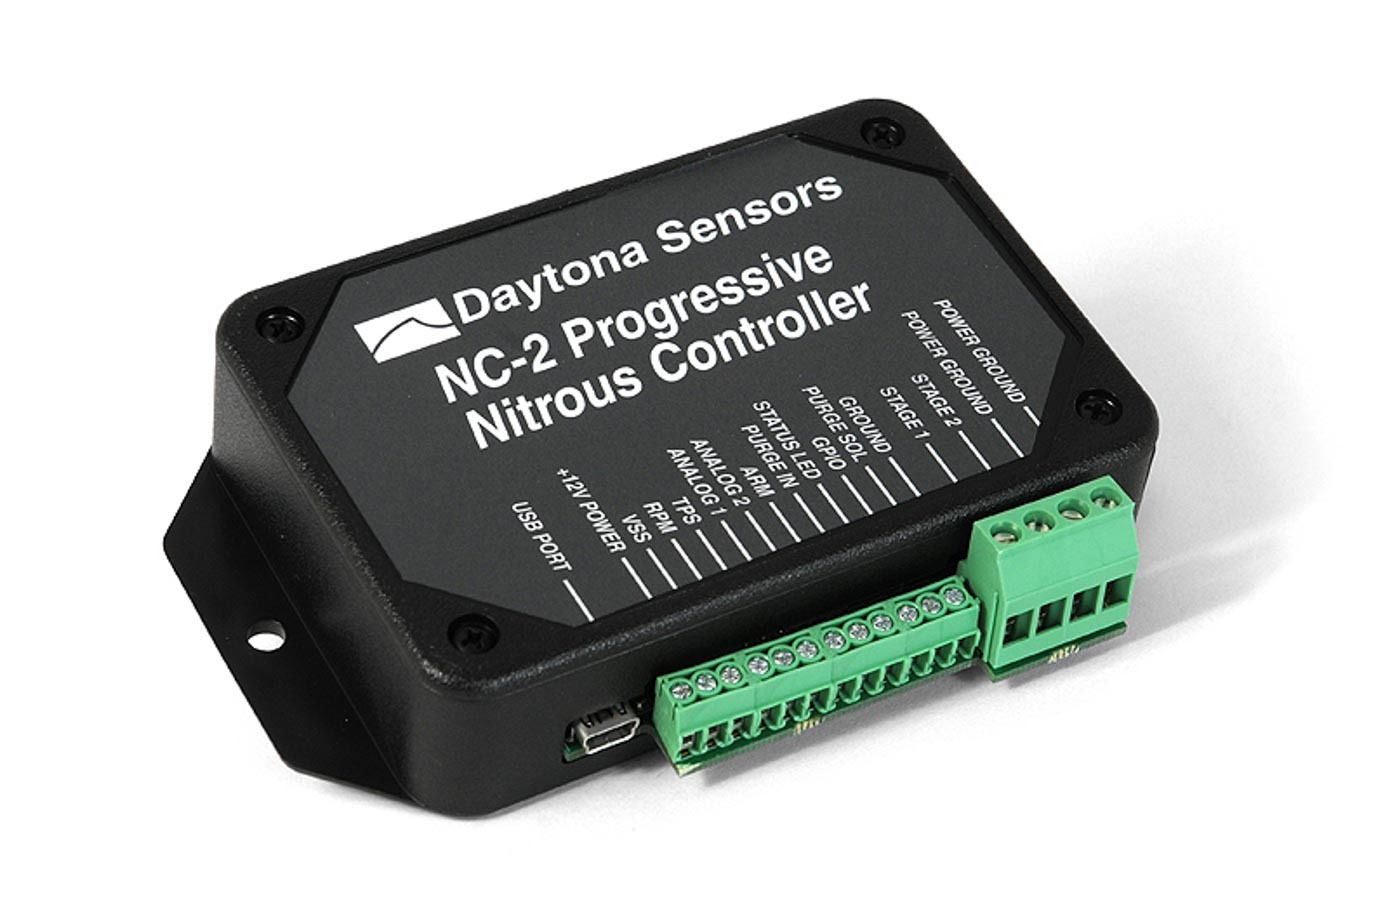 NC-2 Progressive Nitrous Controller/Data Logger